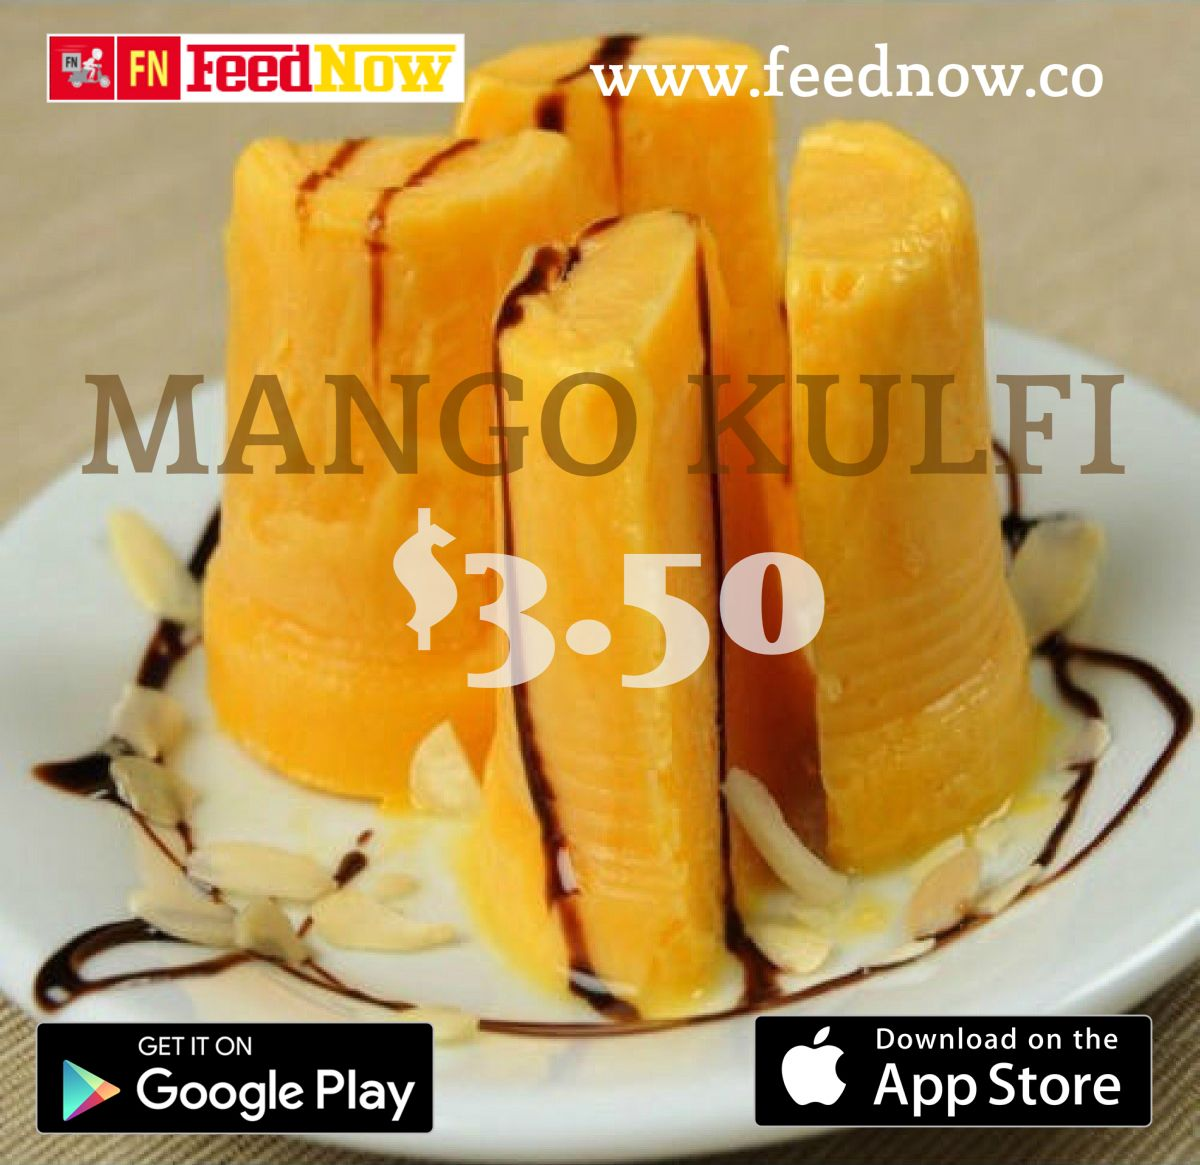 Experience the burst of flavor as the MangoKulfi